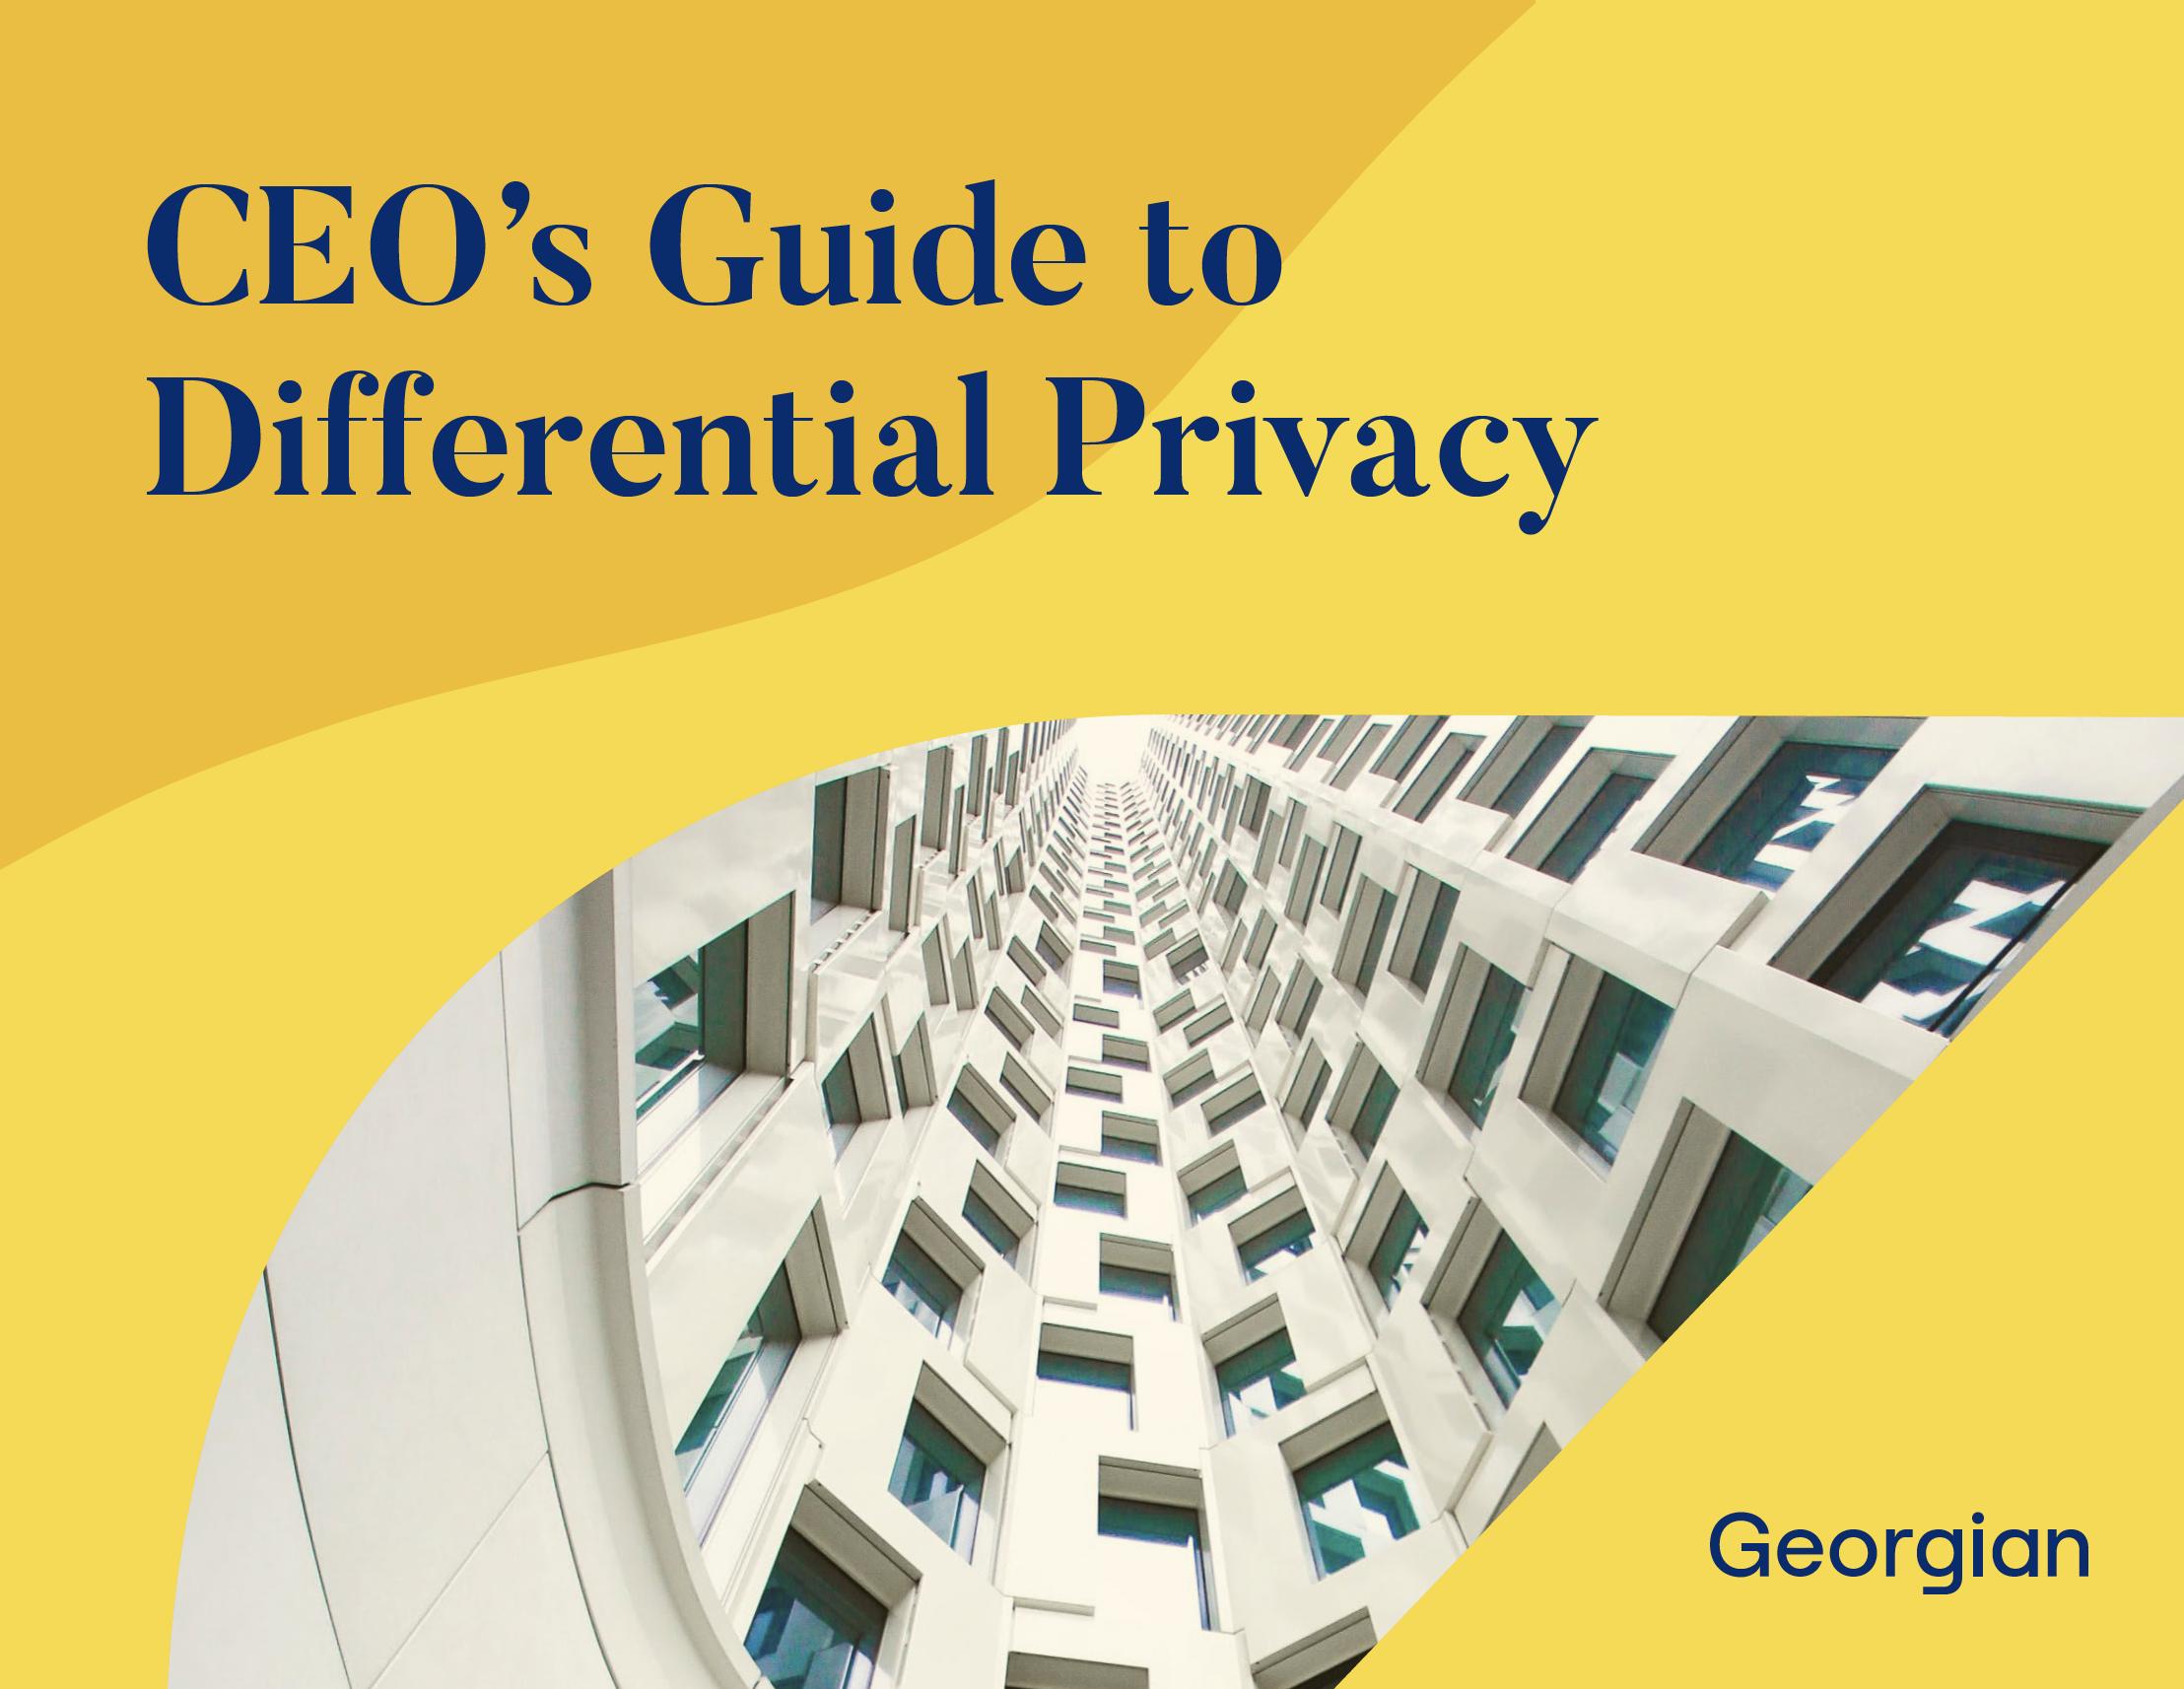 C E O's Guide to Differential Privacy. Georgian.